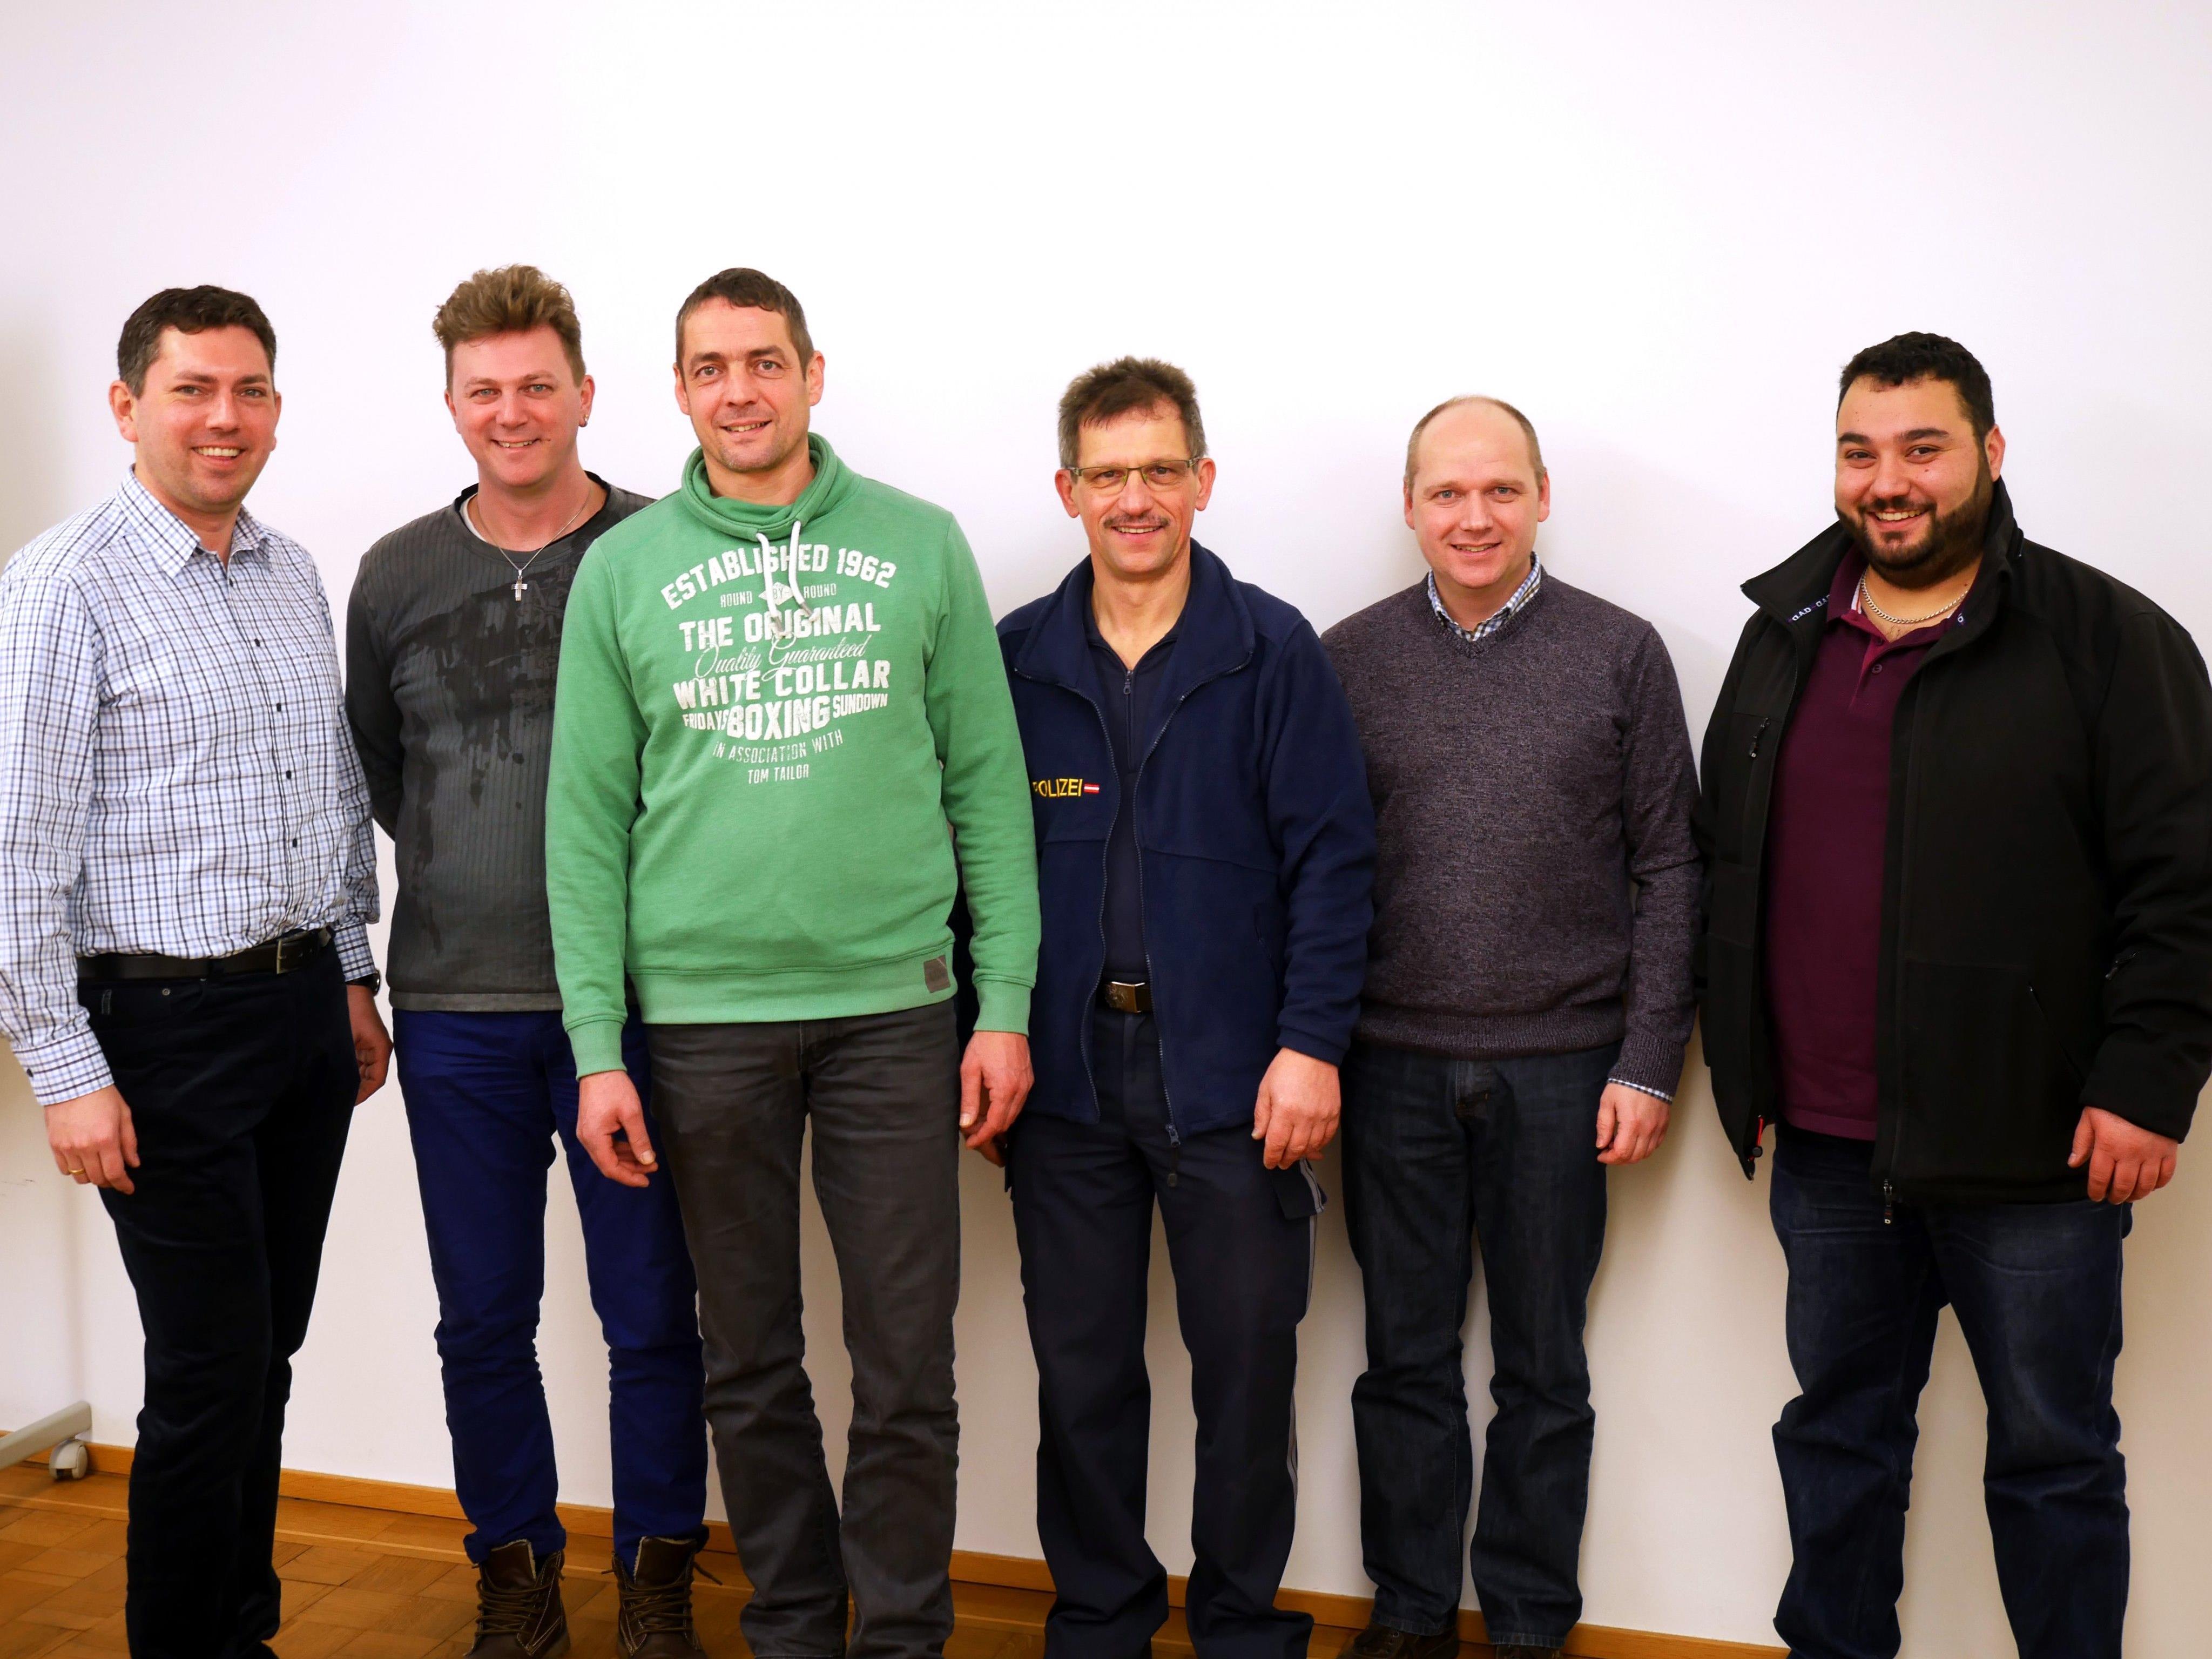 v. l. StR. Mag. (FH) Markus Klien, Ing. Michael Gruber (GIS), Andreas Mathis (Werkhof), Michael Aberer (Stadtpolizei), DI Kurt Giesinger (Stadtwerke), Ing. Mustafa Coşkun (Tiefbau)